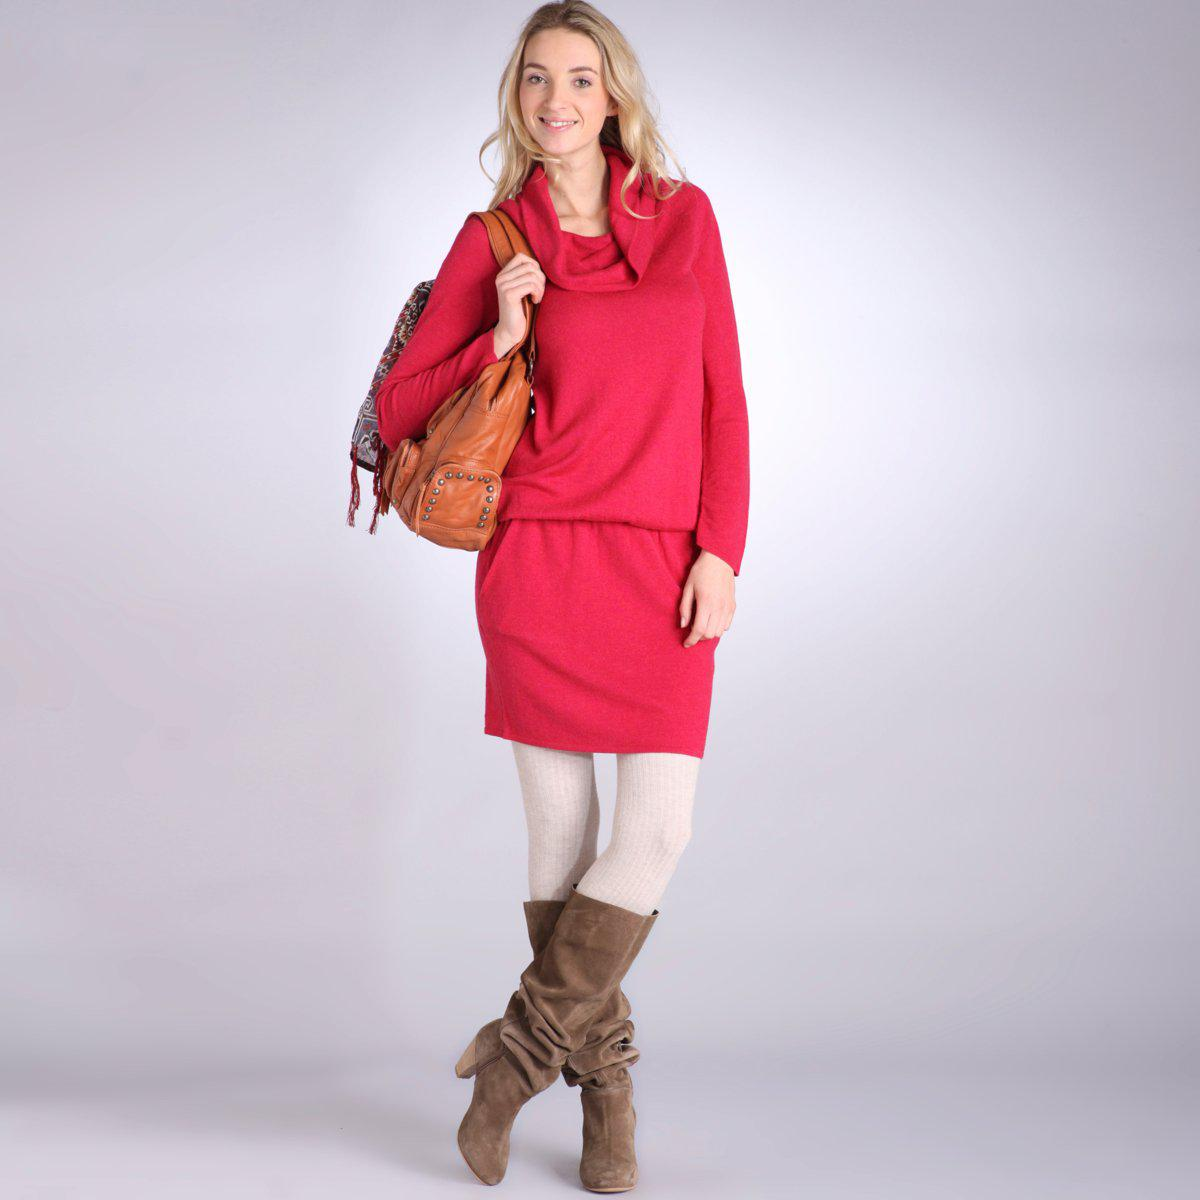 bradyna foremata 276 - Βραδυνα Φορεματα LaRedoute Χειμώνας 2012 Κωδ. 324205489